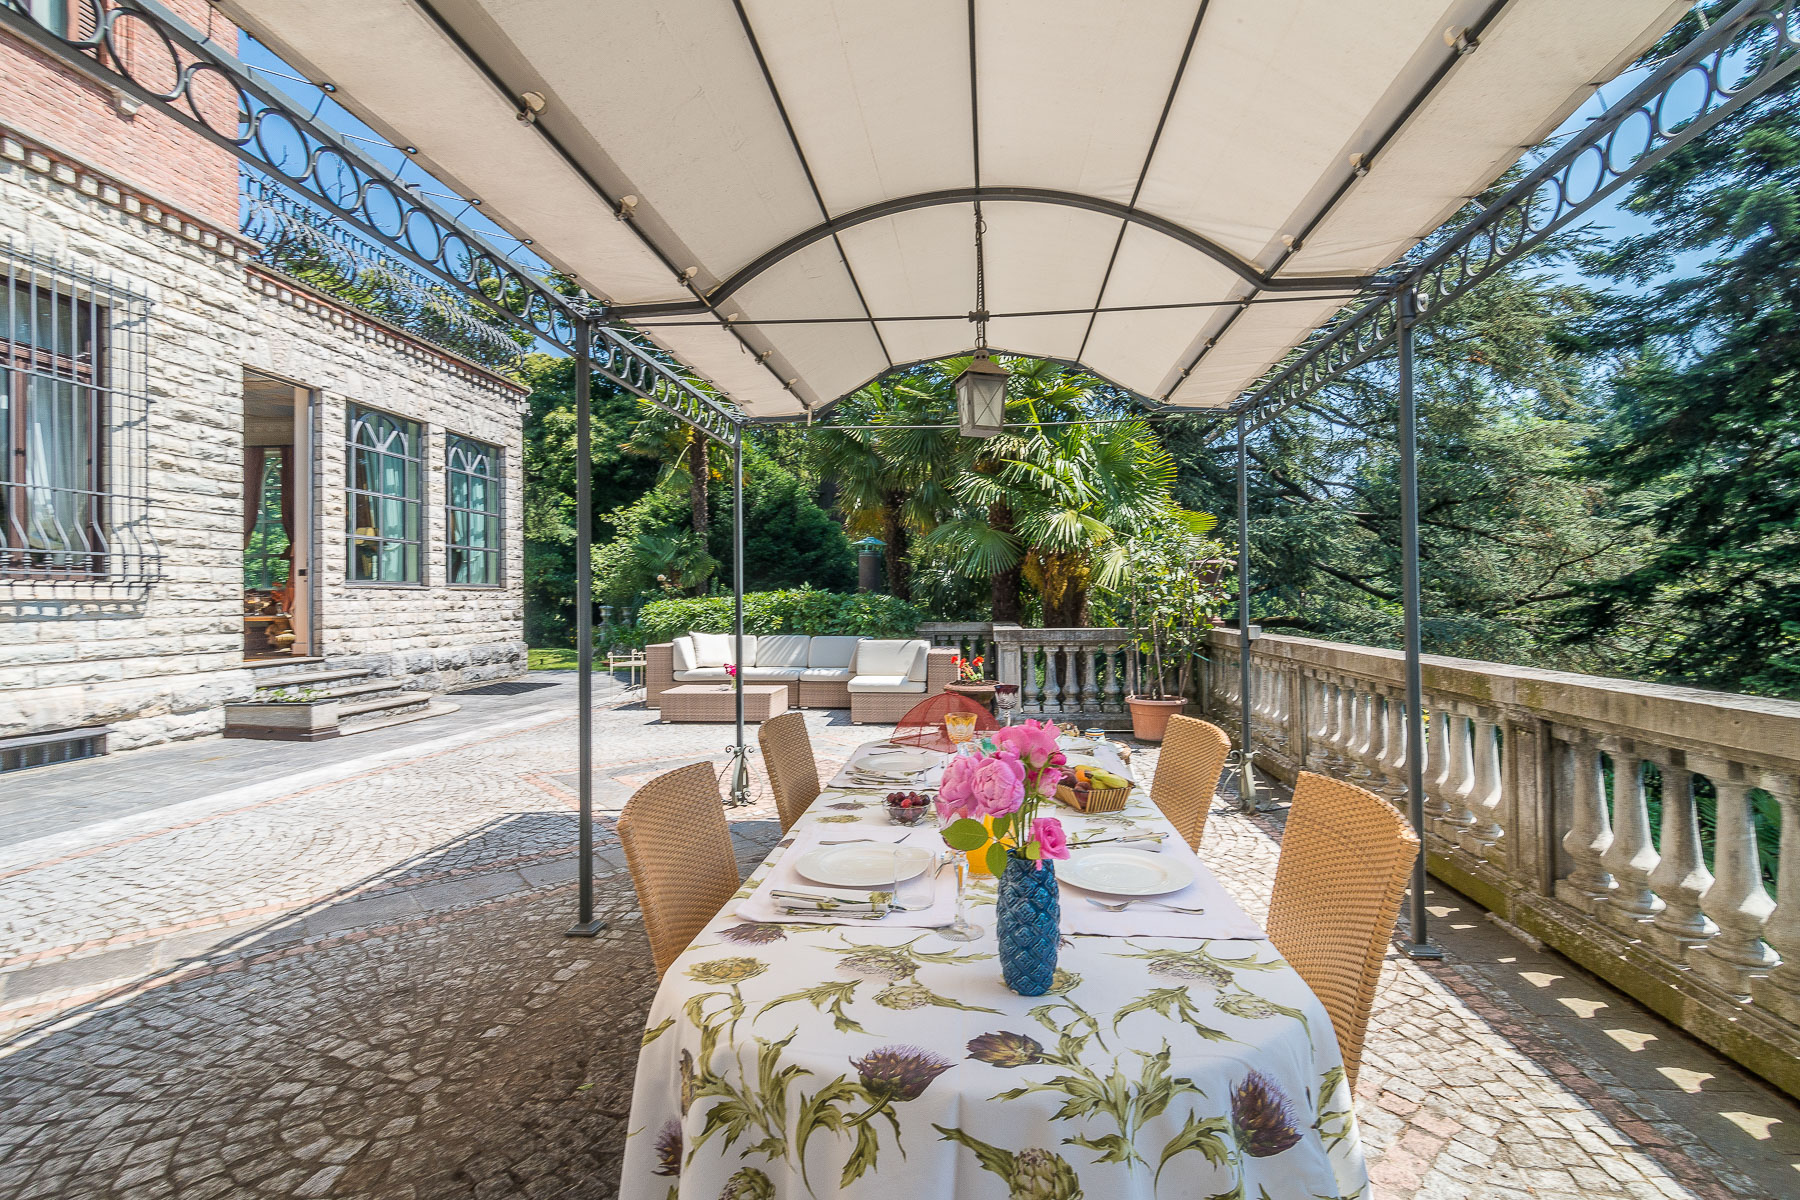 Villa in Vendita a Varese: 5 locali, 1150 mq - Foto 10